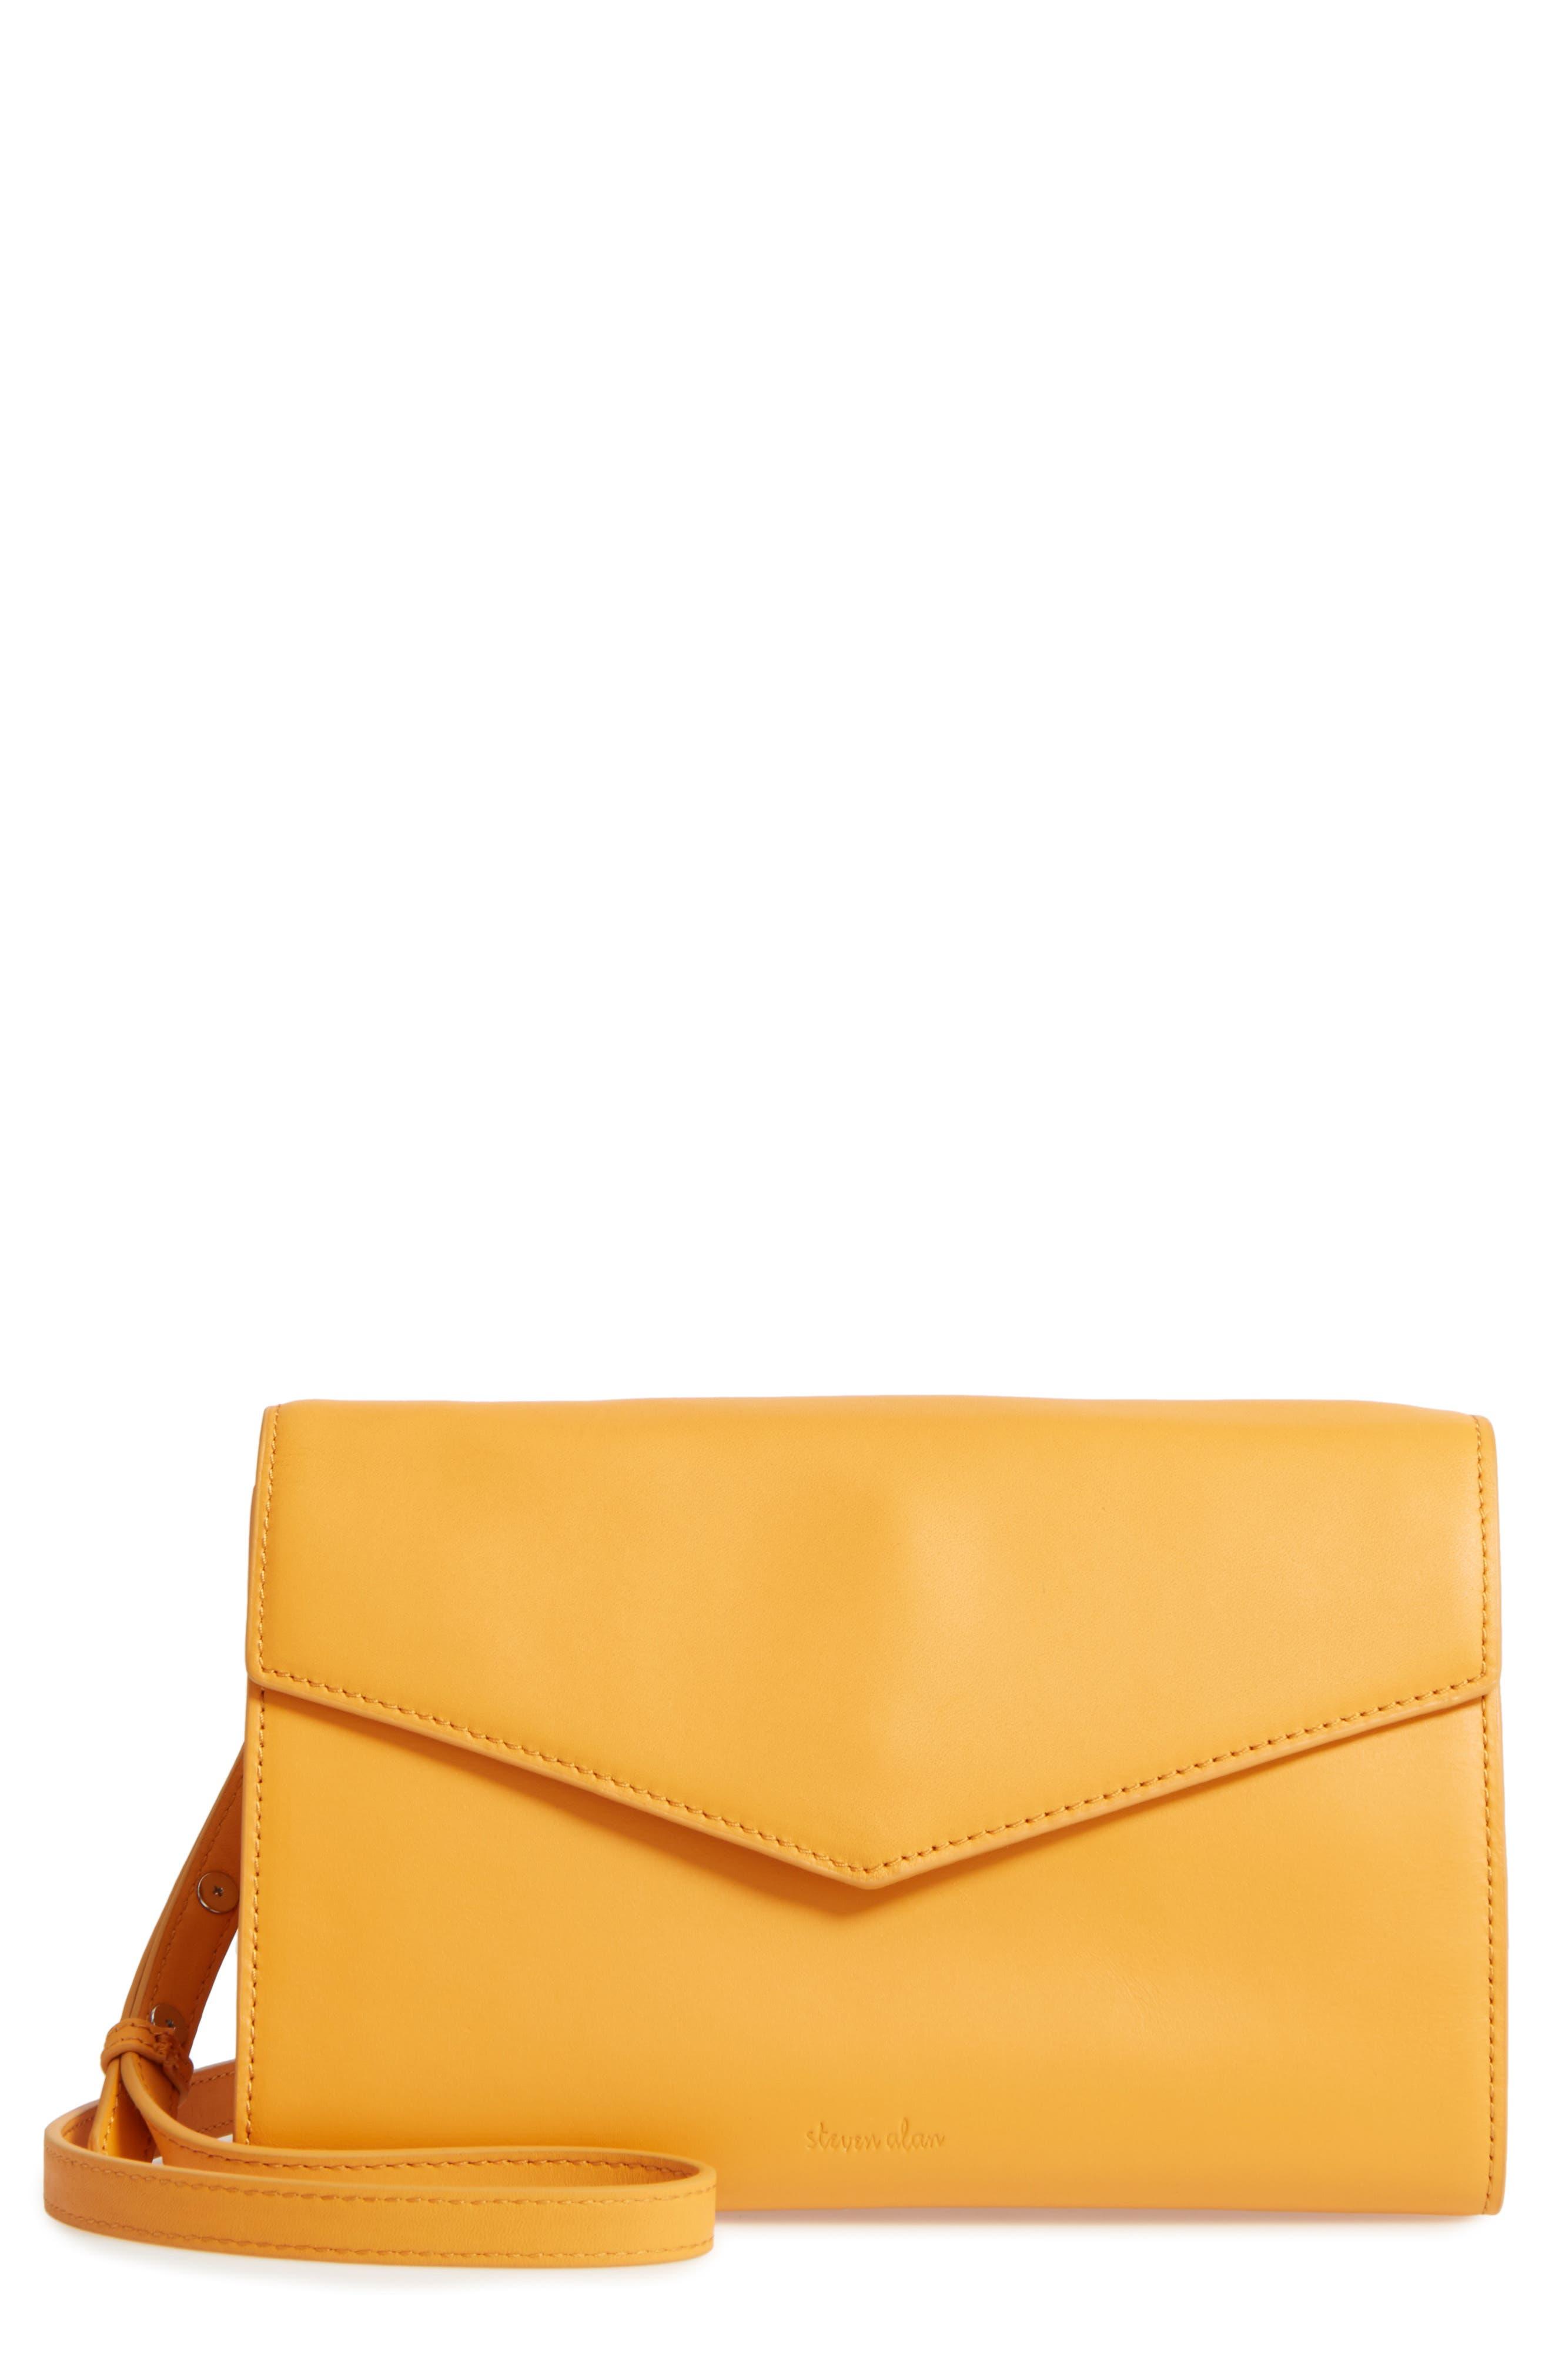 Easton Leather Envelope Crossbody Bag,                             Main thumbnail 1, color,                             Ochre